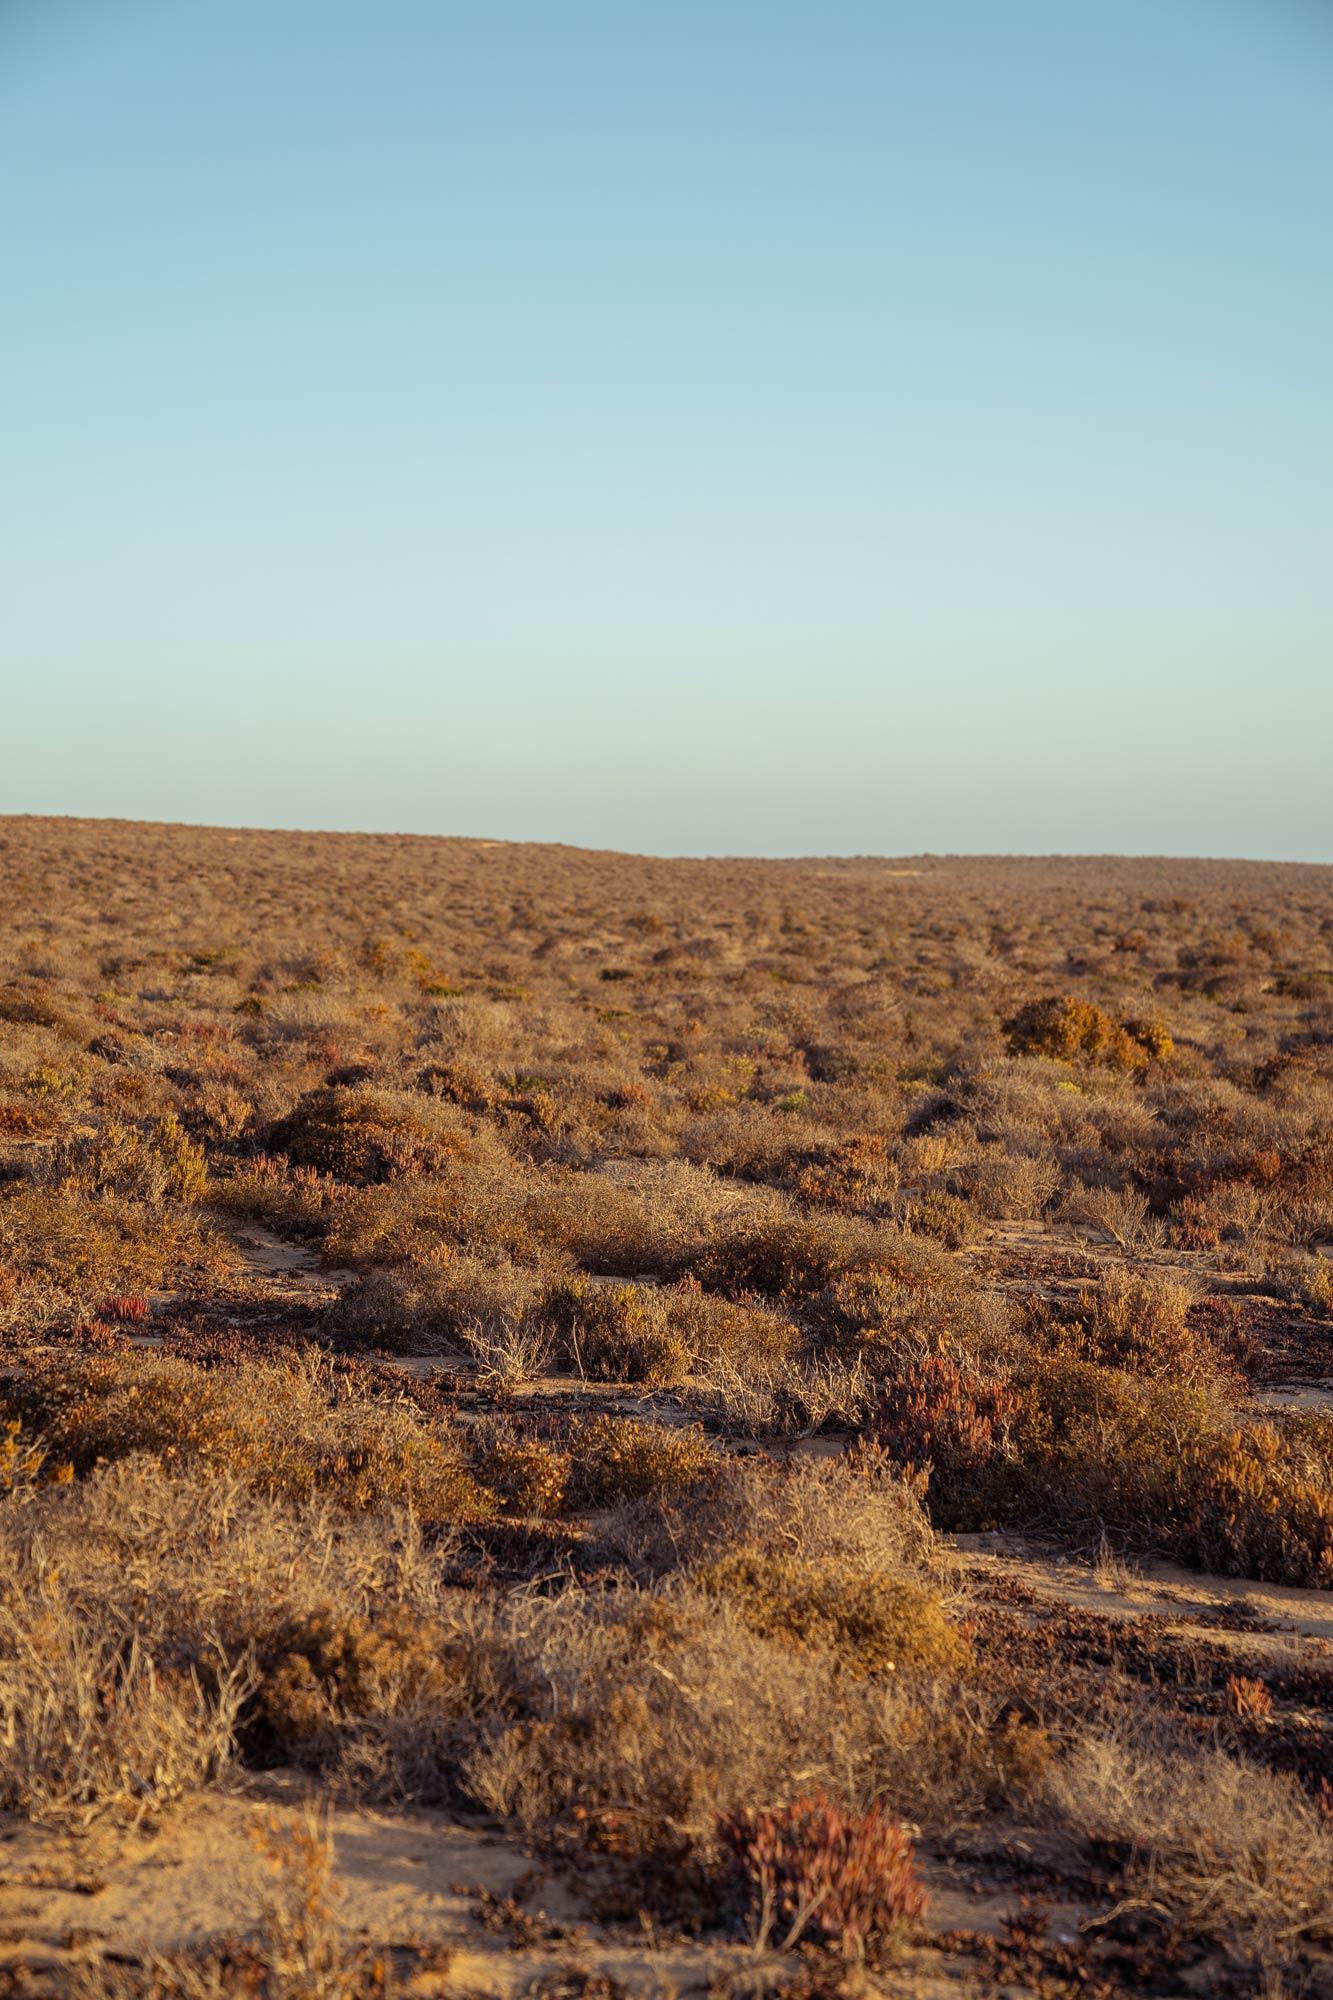 Semi desert eco region of the Nama Karoo Image Copyright Soonafternoon